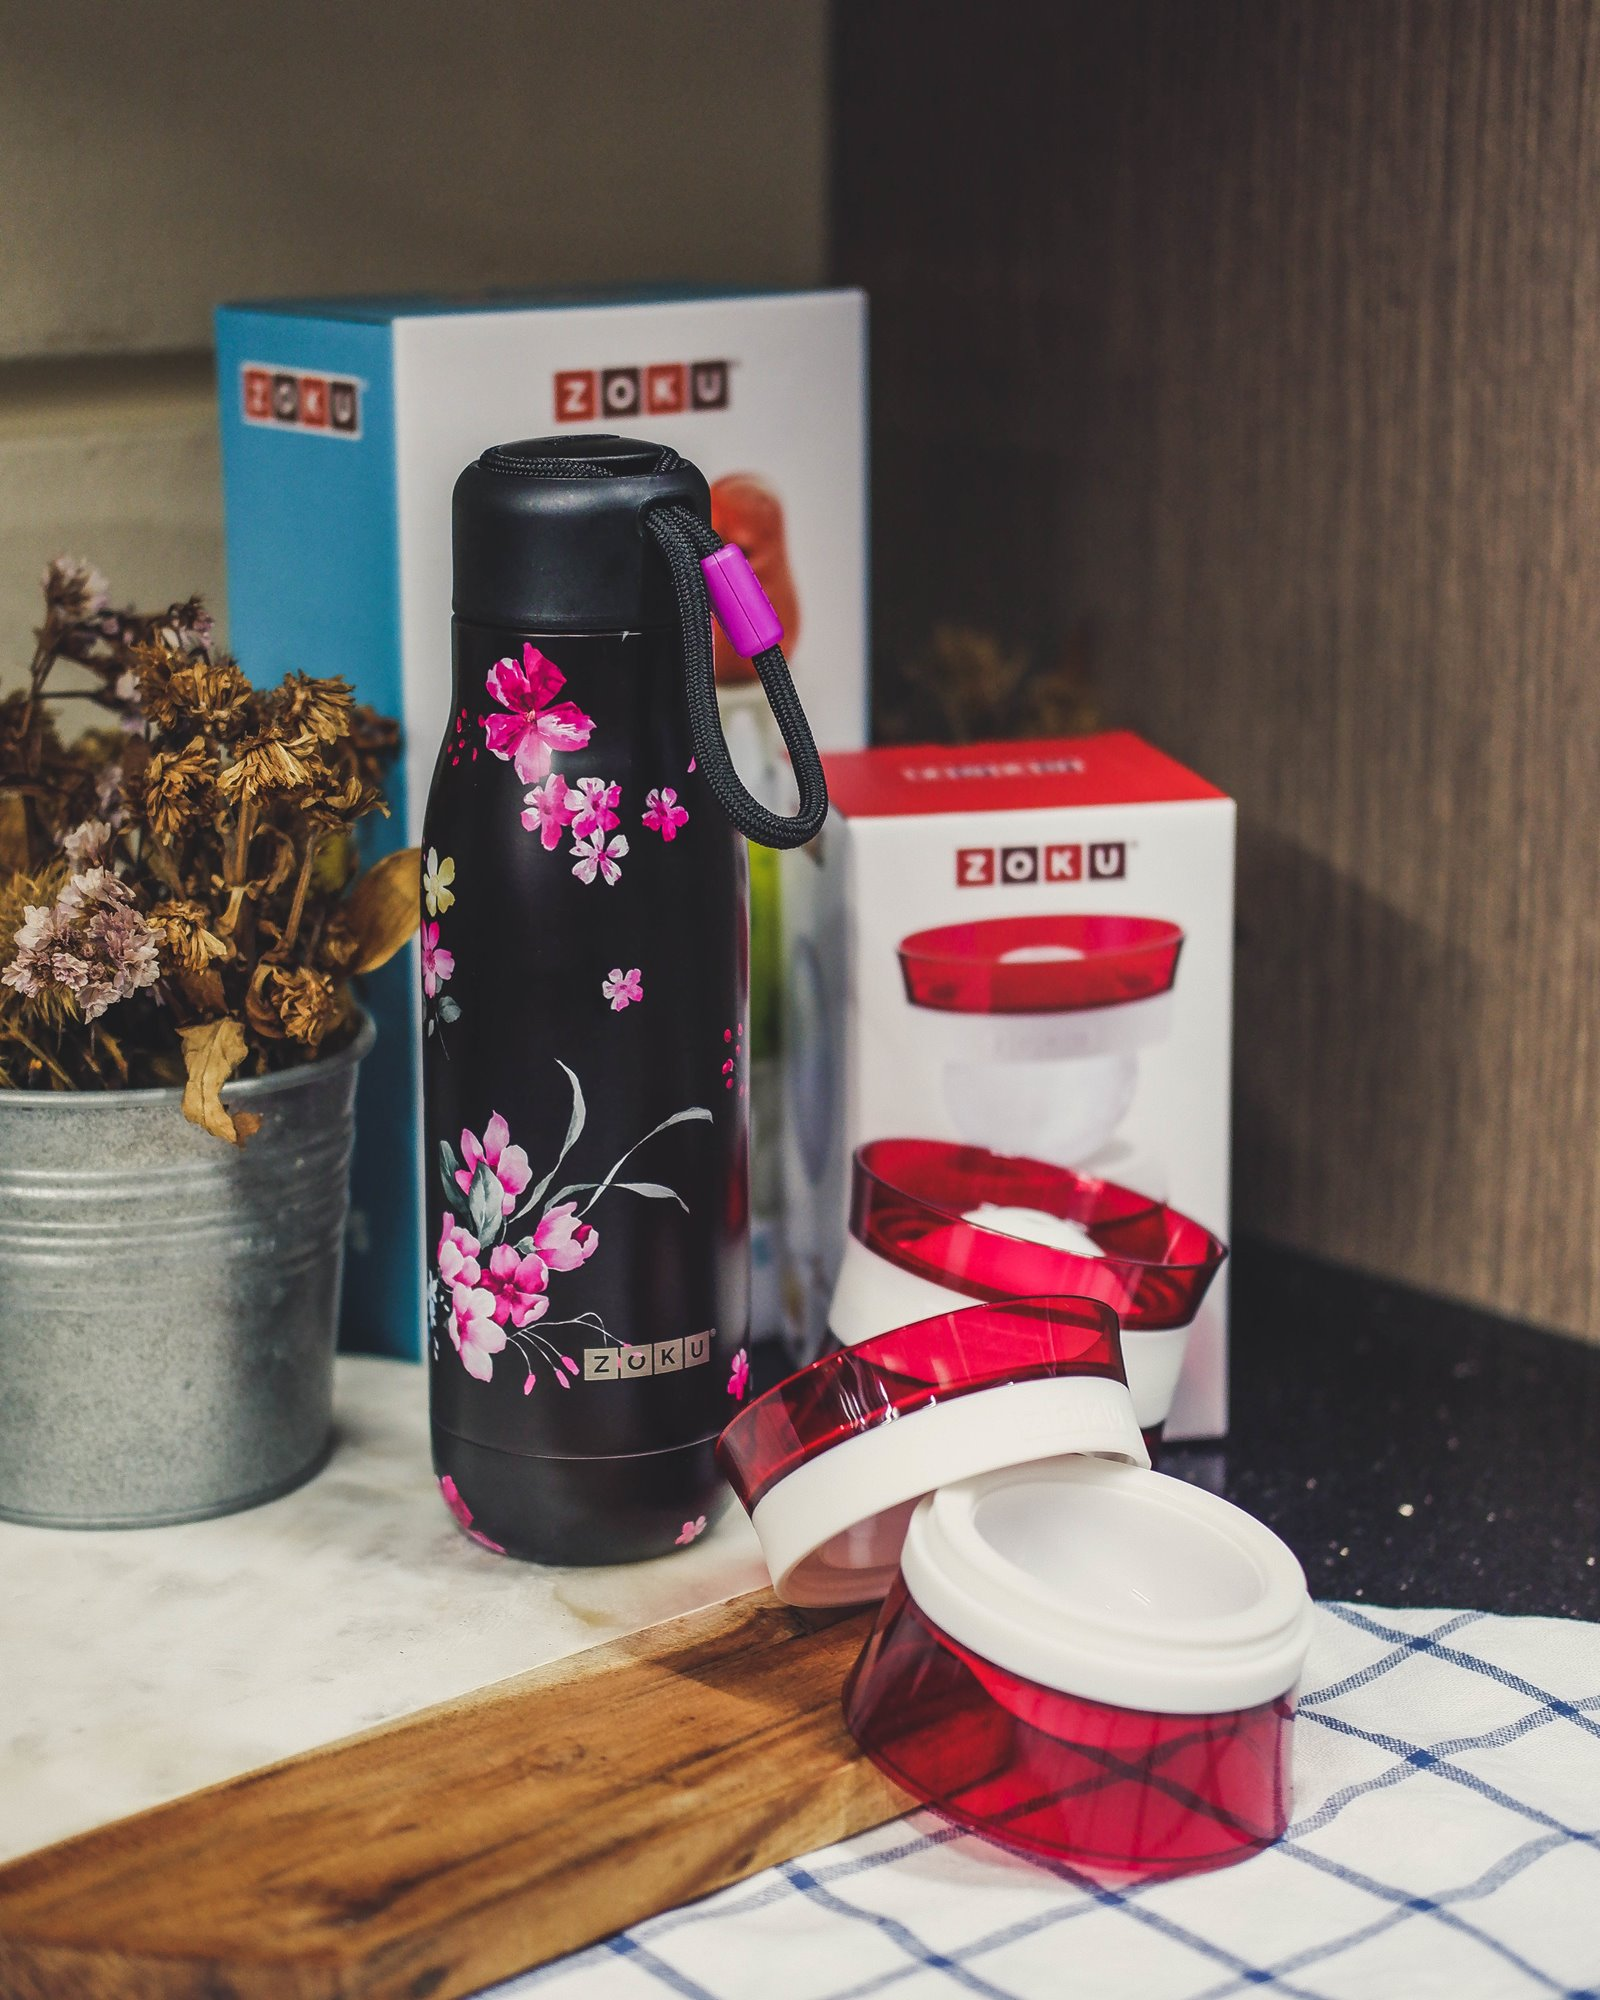 9.9 Lazada X ZOKU Zoku Kitchen & Dining by Gizmo Hub 2018 Surprise Box